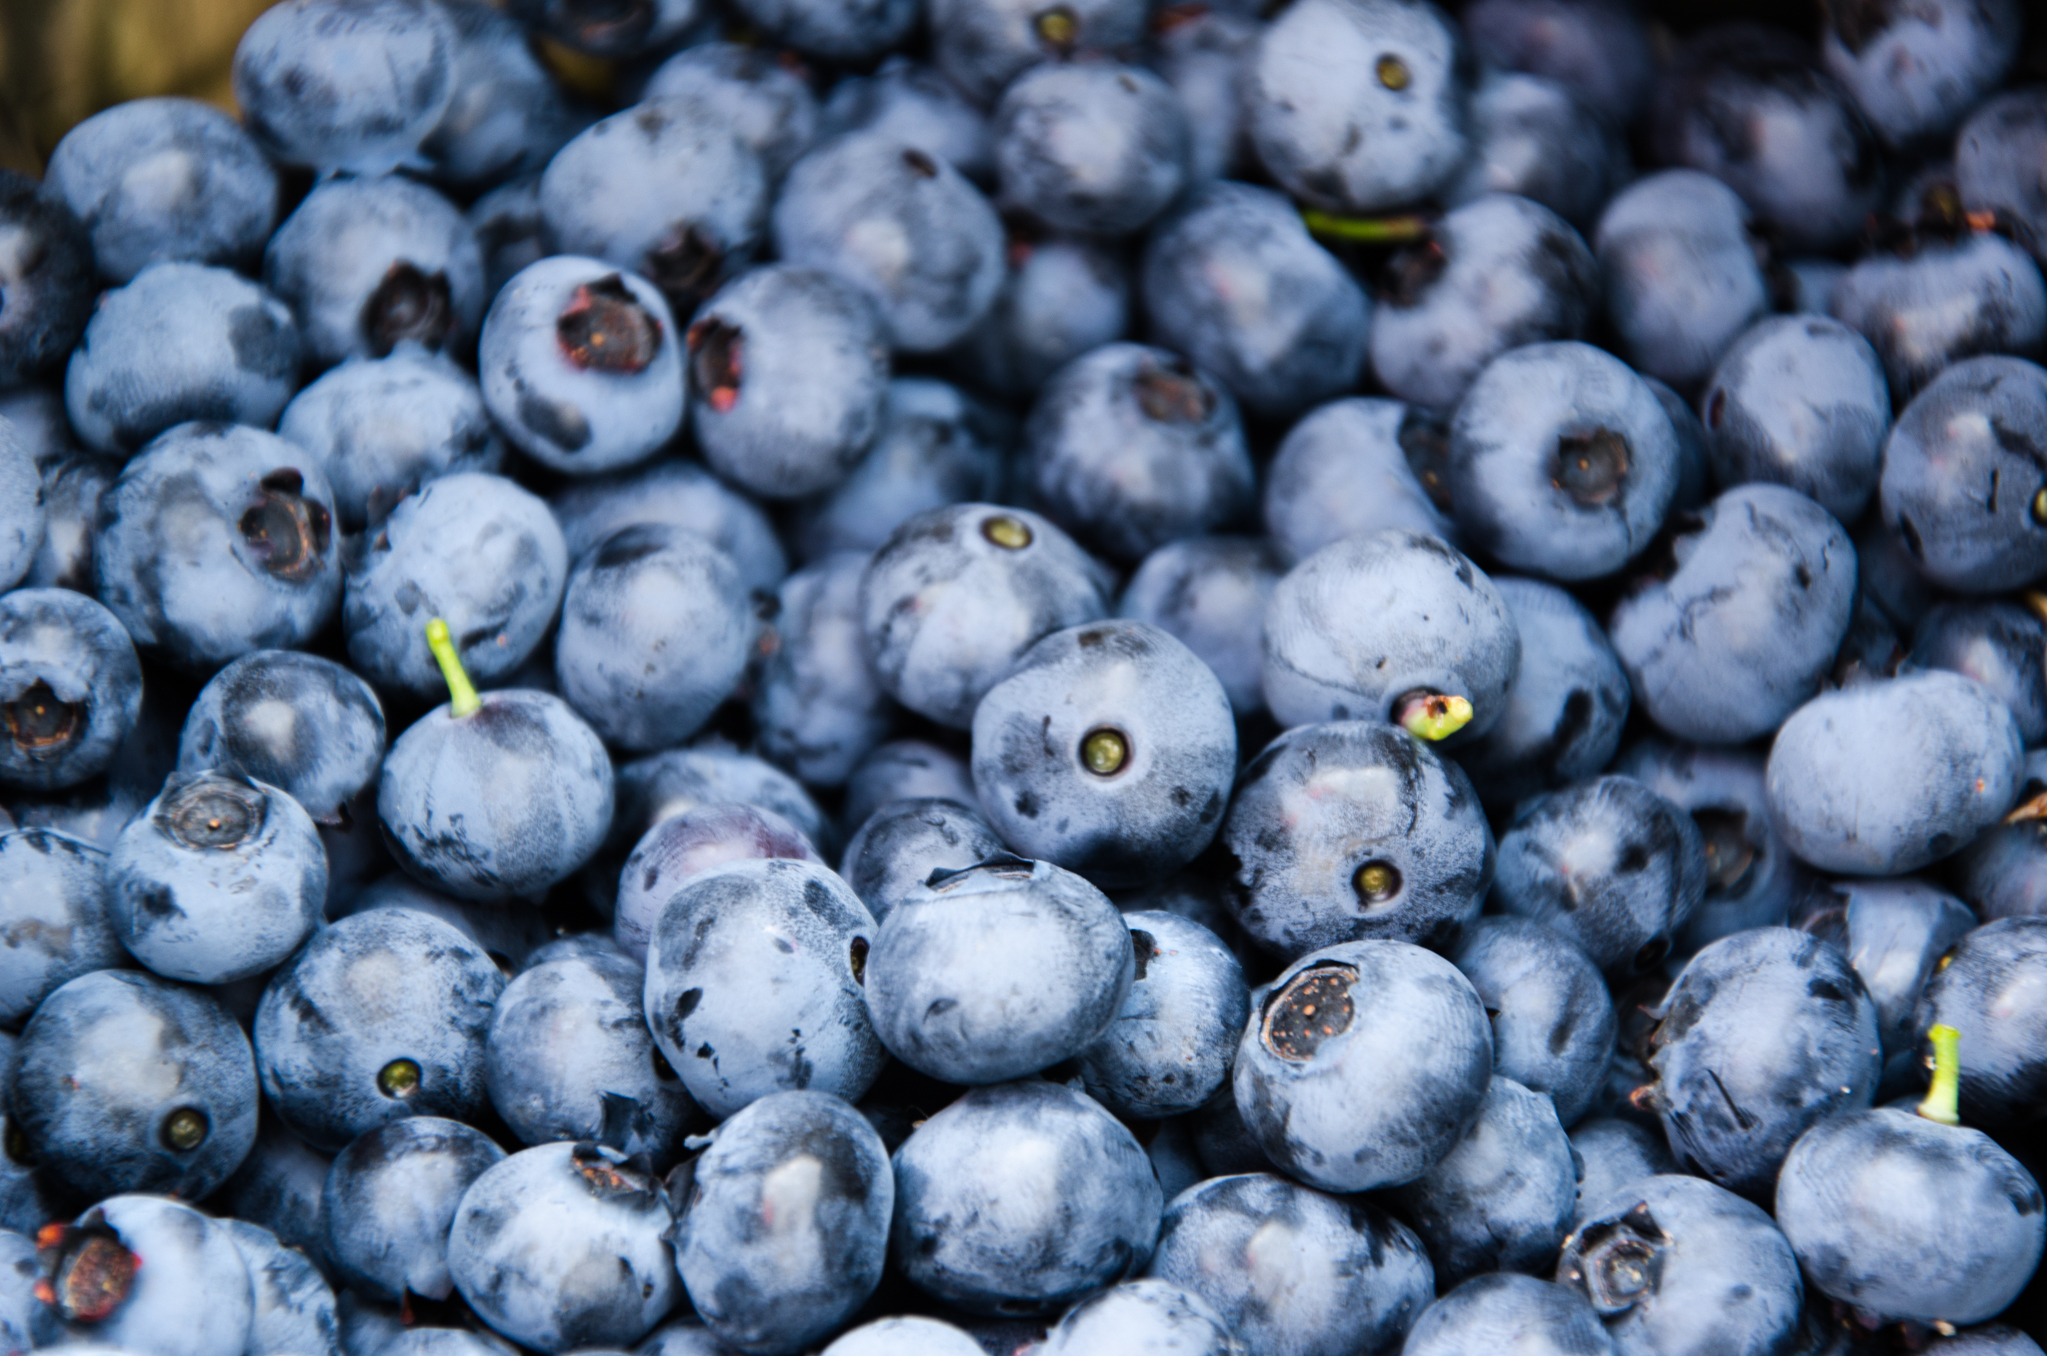 Reward for work - Blueberries, by: @rsseattle, source: flickr